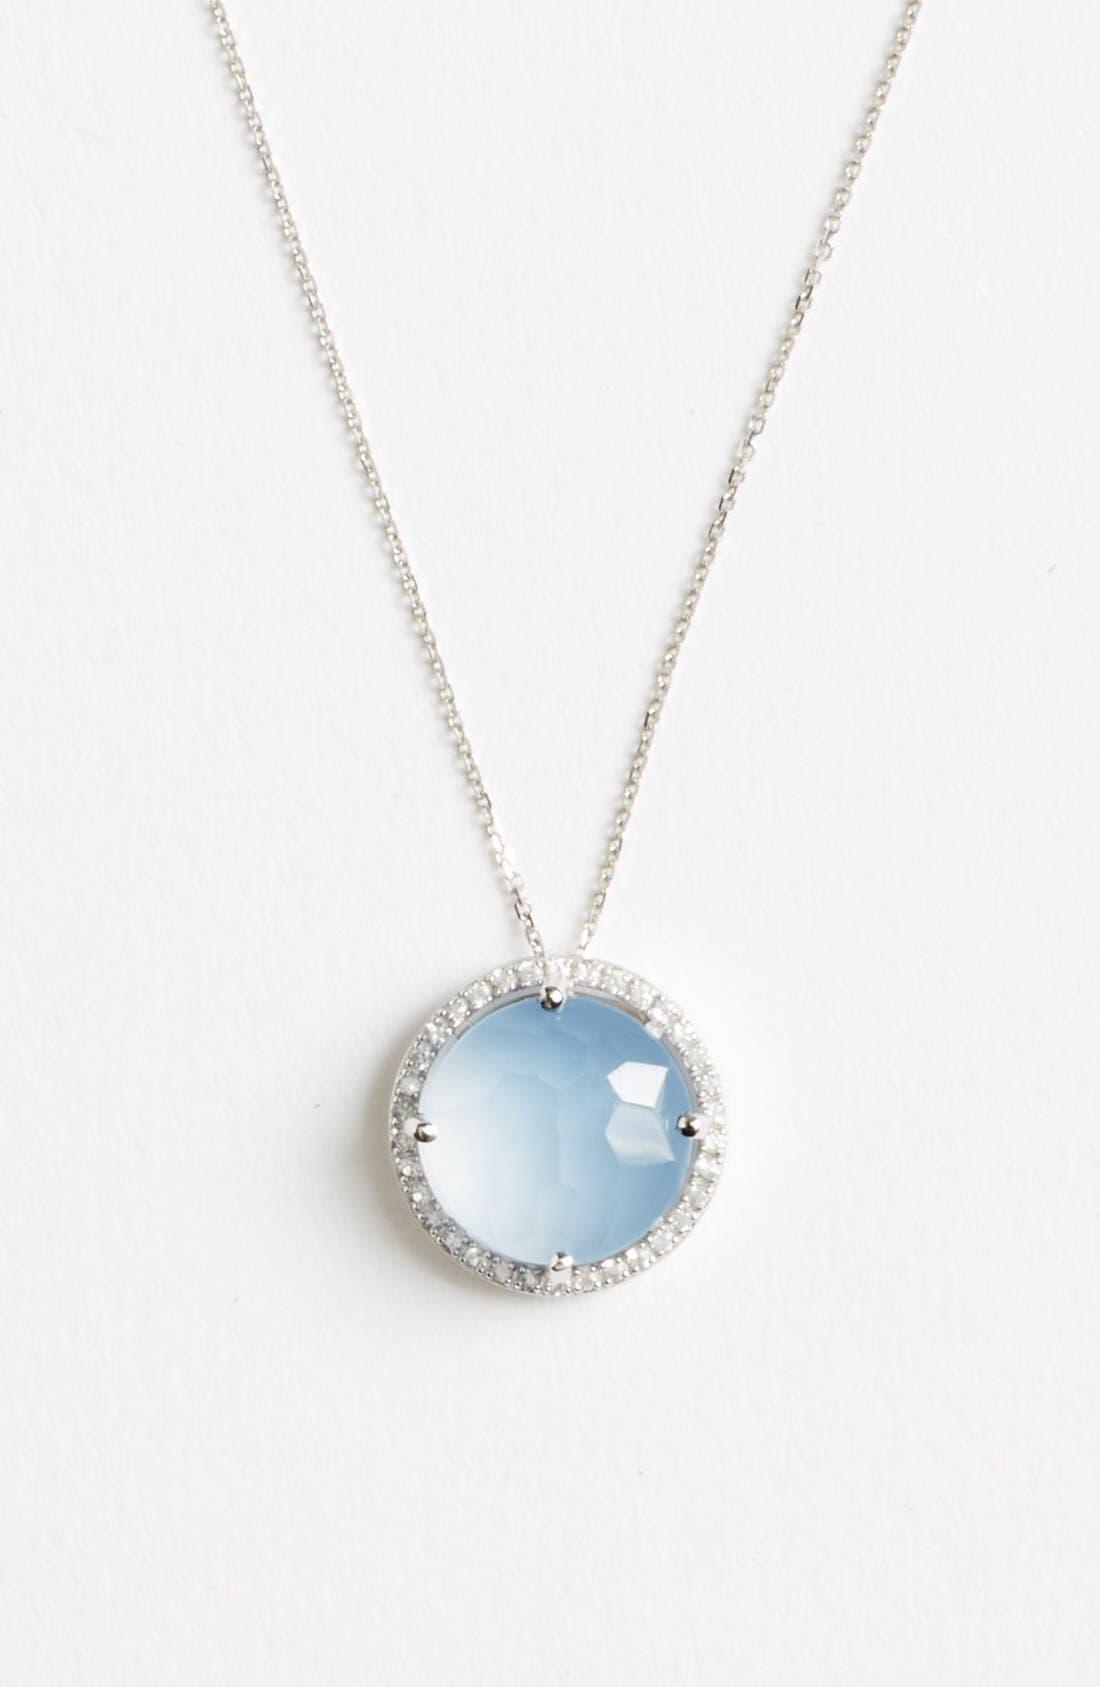 Main Image - KALAN by Suzanne Kalan Stone & Sapphire Pendant Necklace